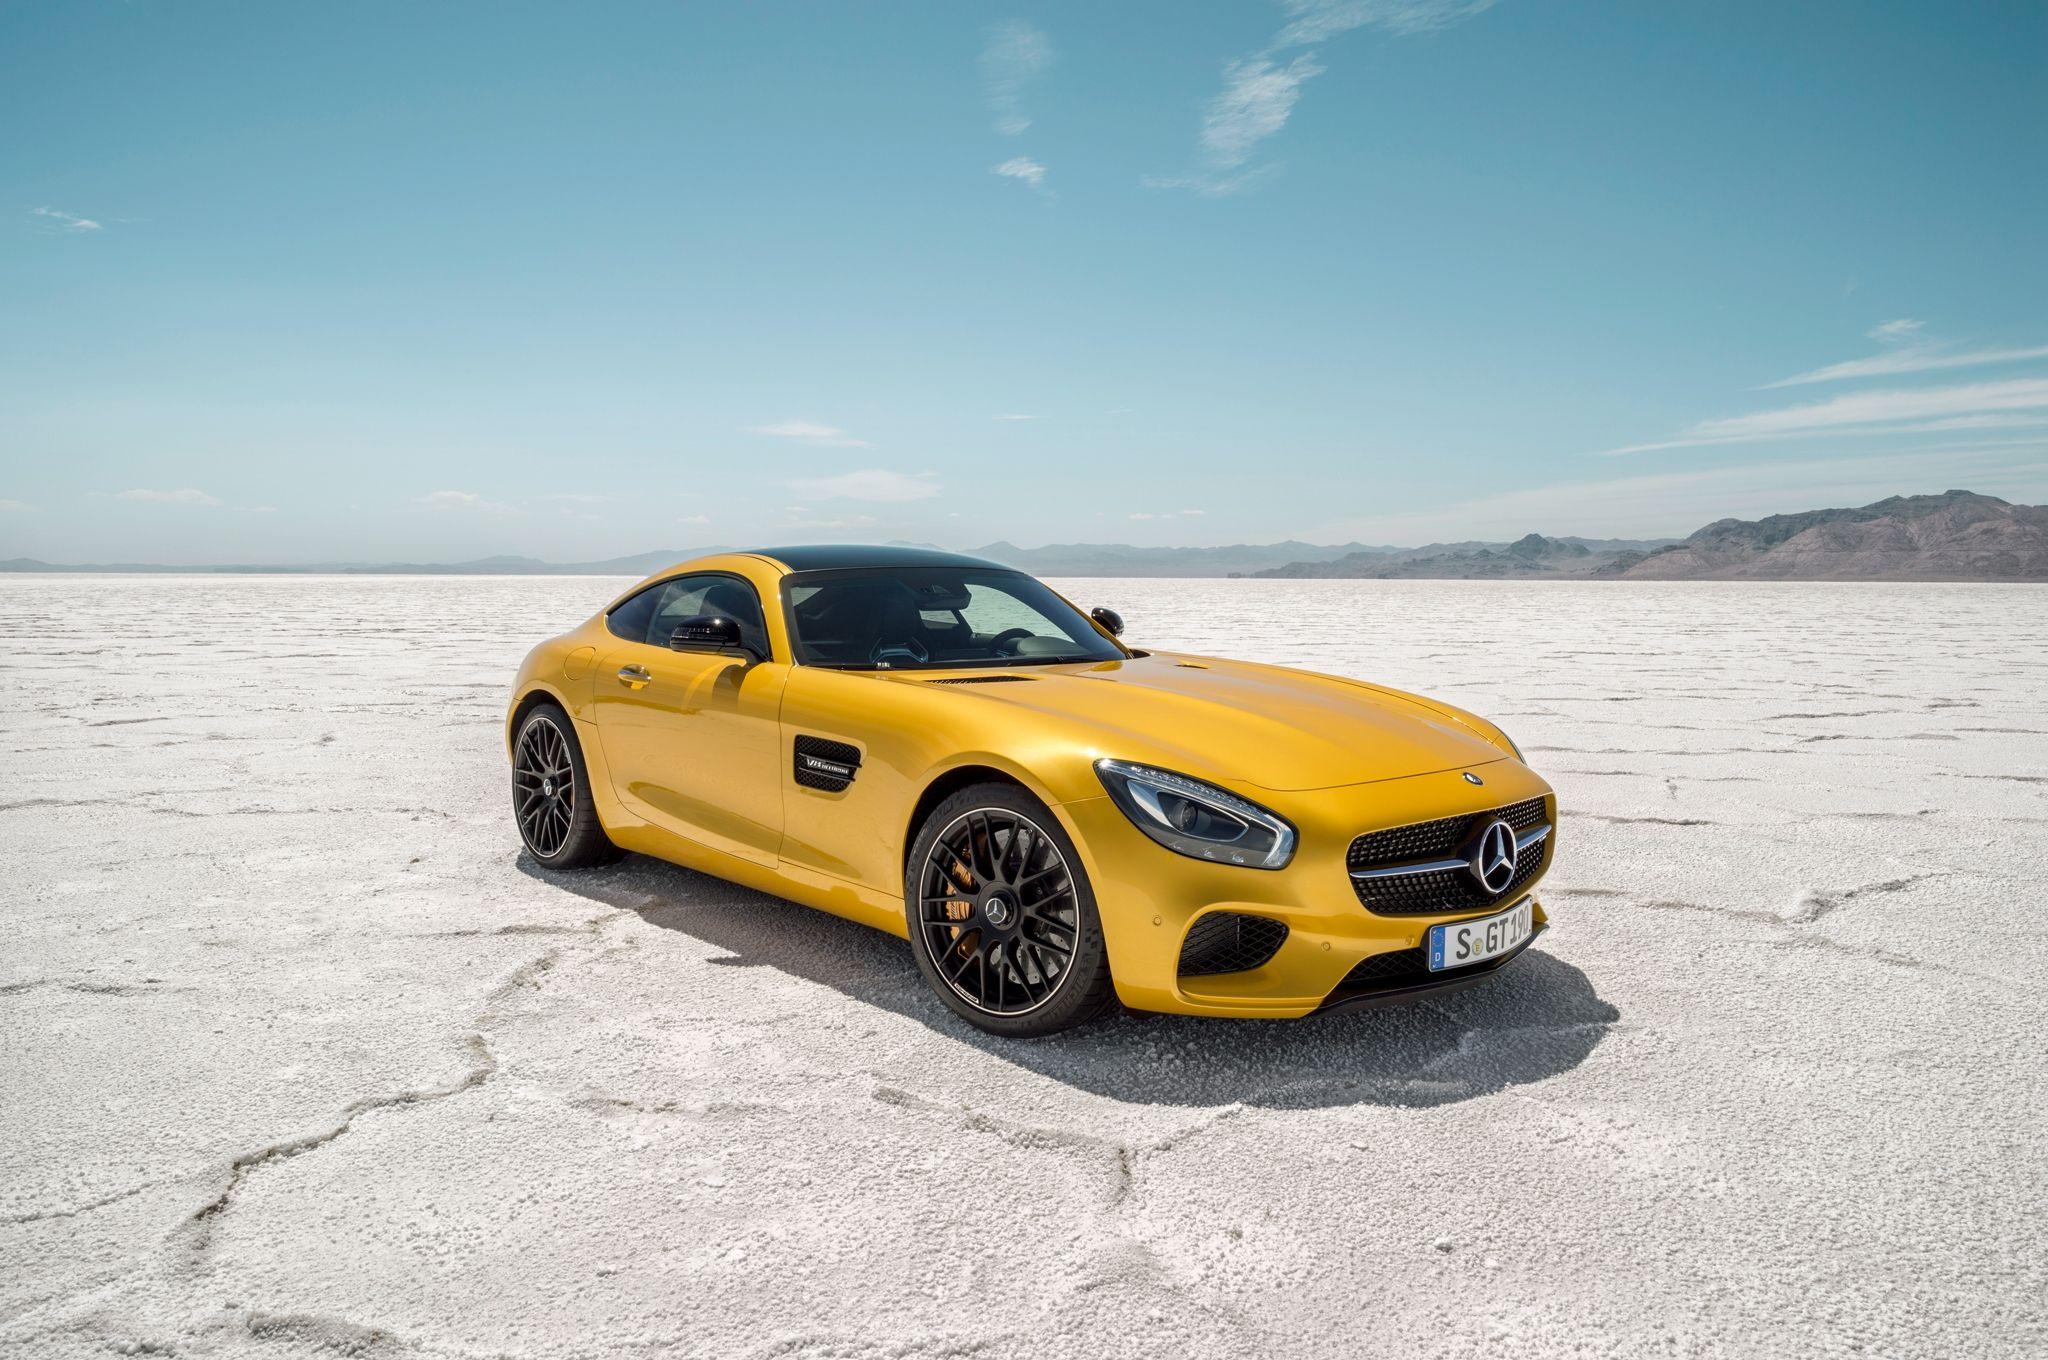 New Mercedes Benz Amg Gt Is Flashy High Performance Sports Car